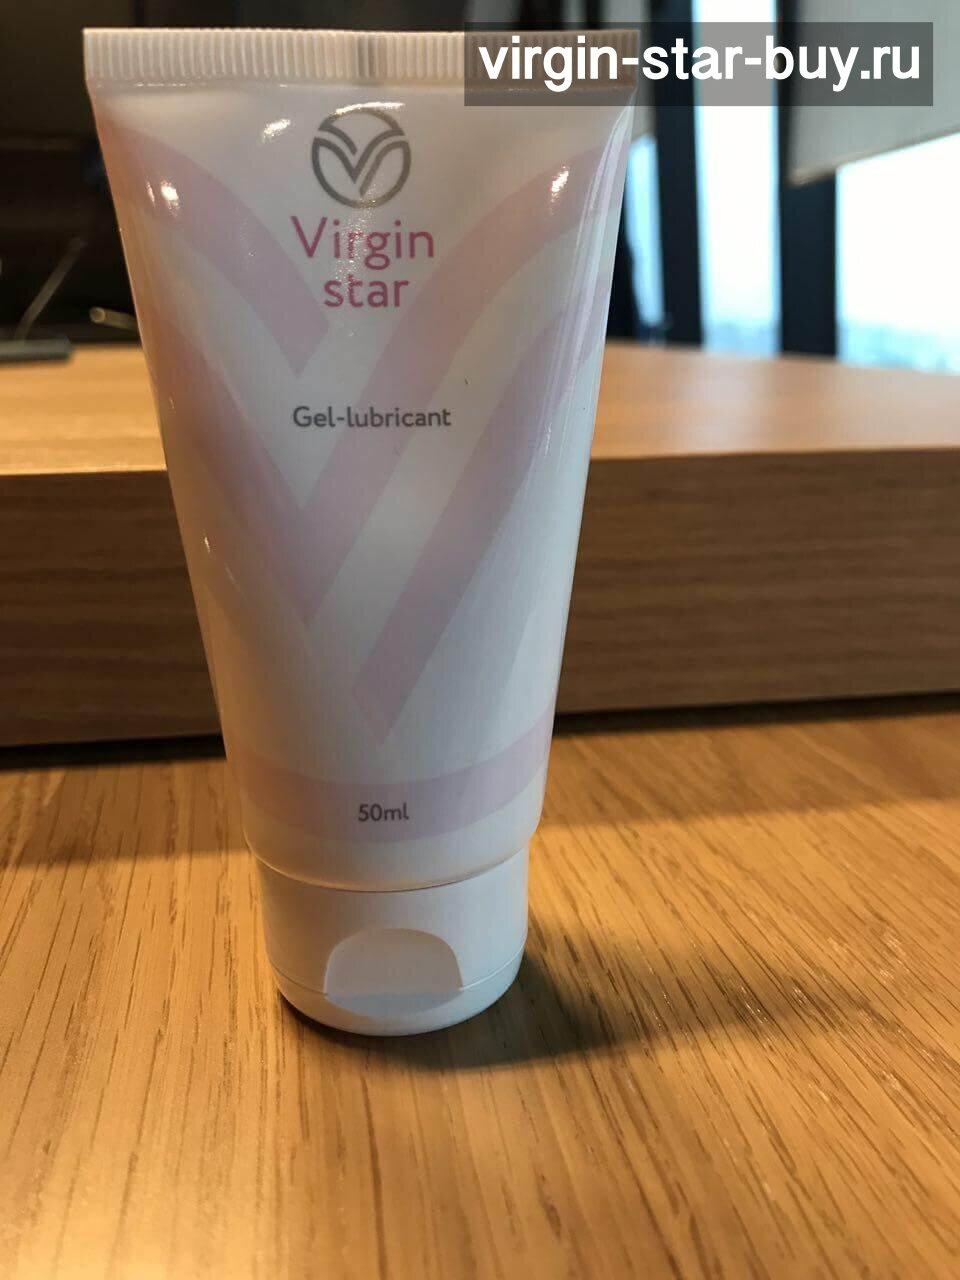 Virgin Star для сокращения мышц влагалища в Сыктывкаре